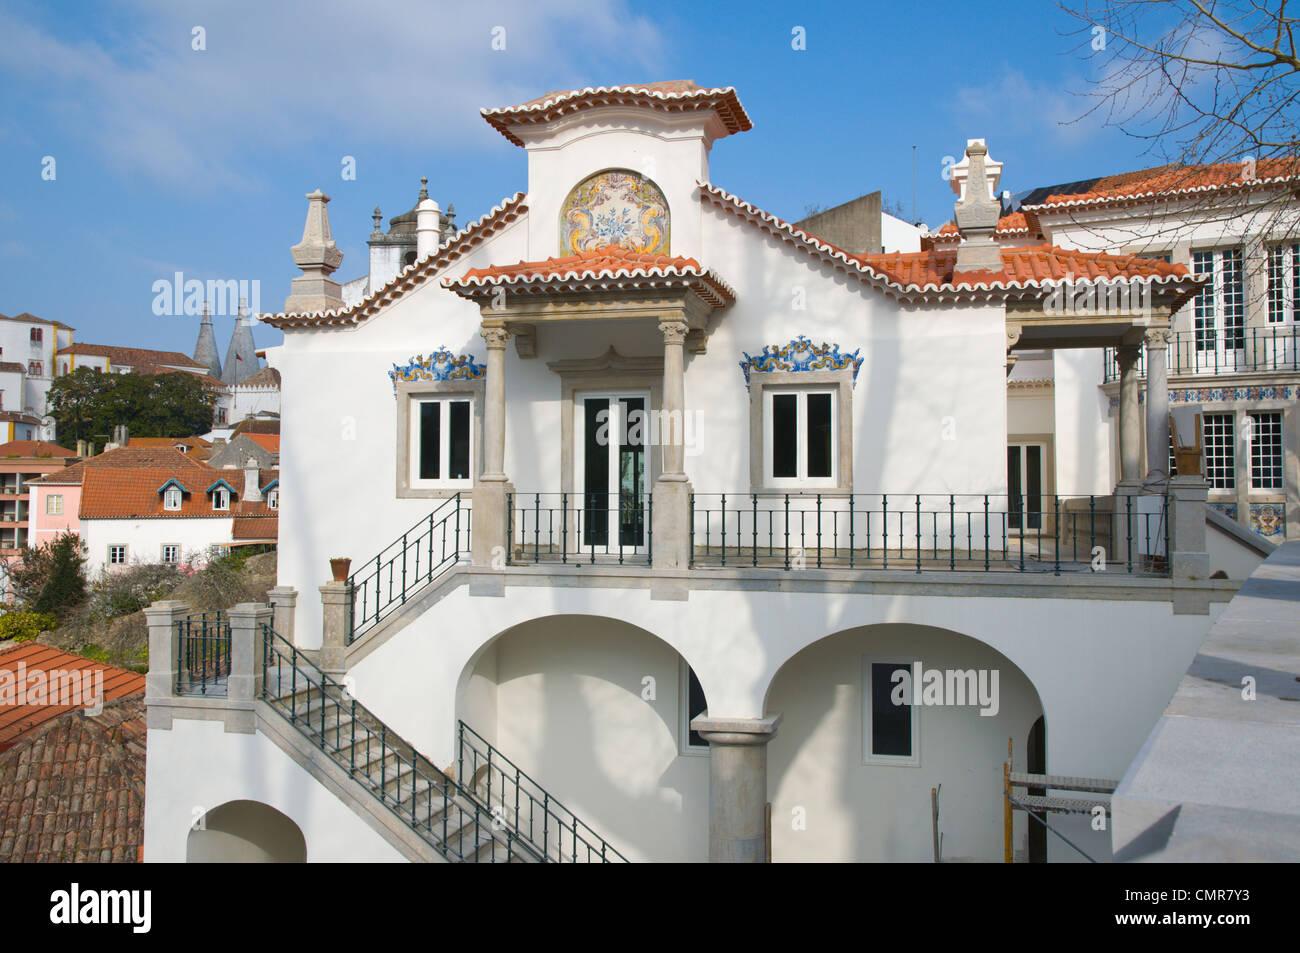 Mansion being refurbished Sintra Portugal Europe - Stock Image